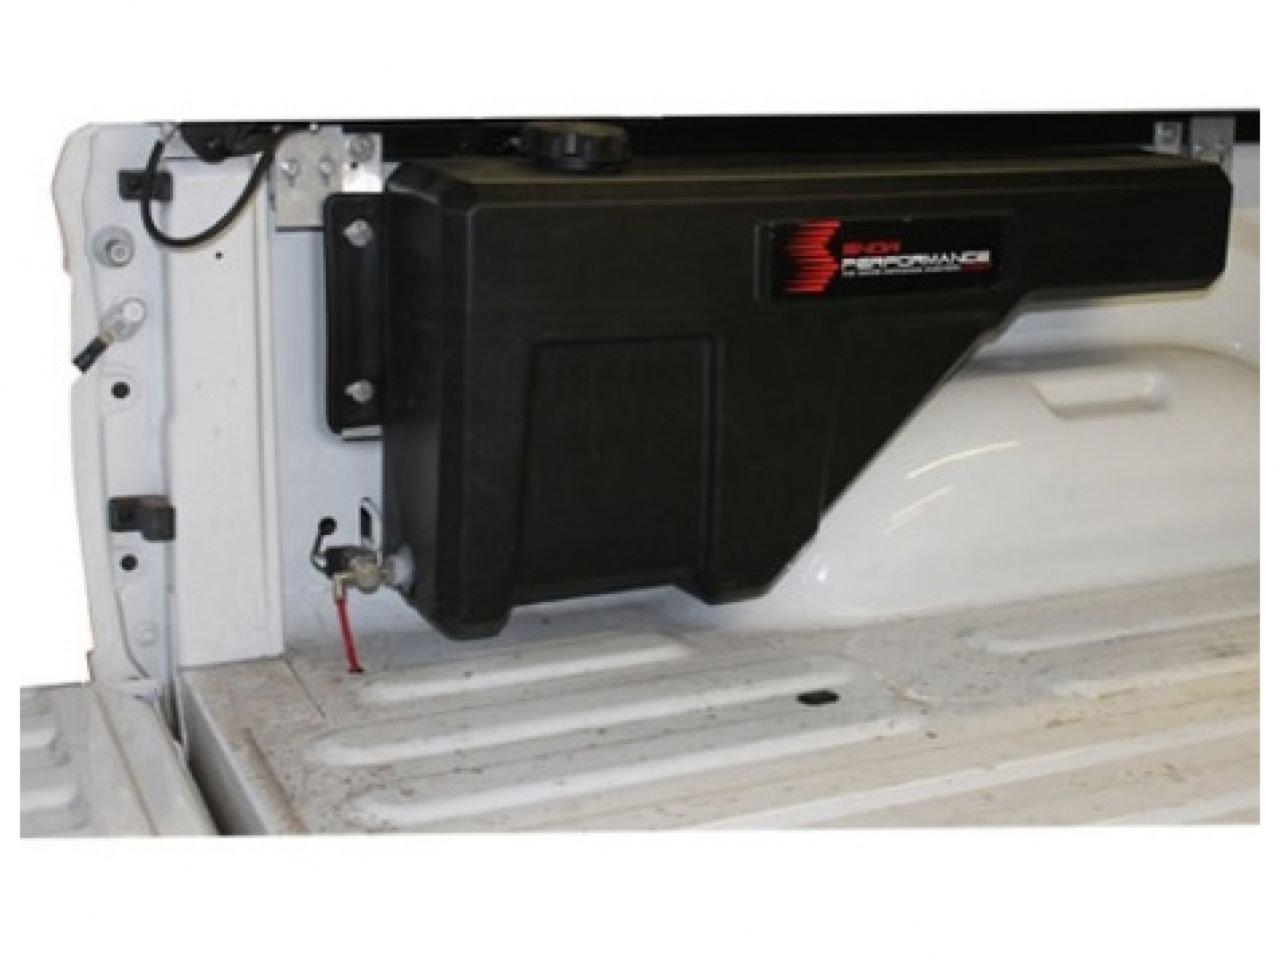 10 Gallon Tool Box Style Snow Performance 40015 Reservoir incl. Brackets//Check Valve//tubing